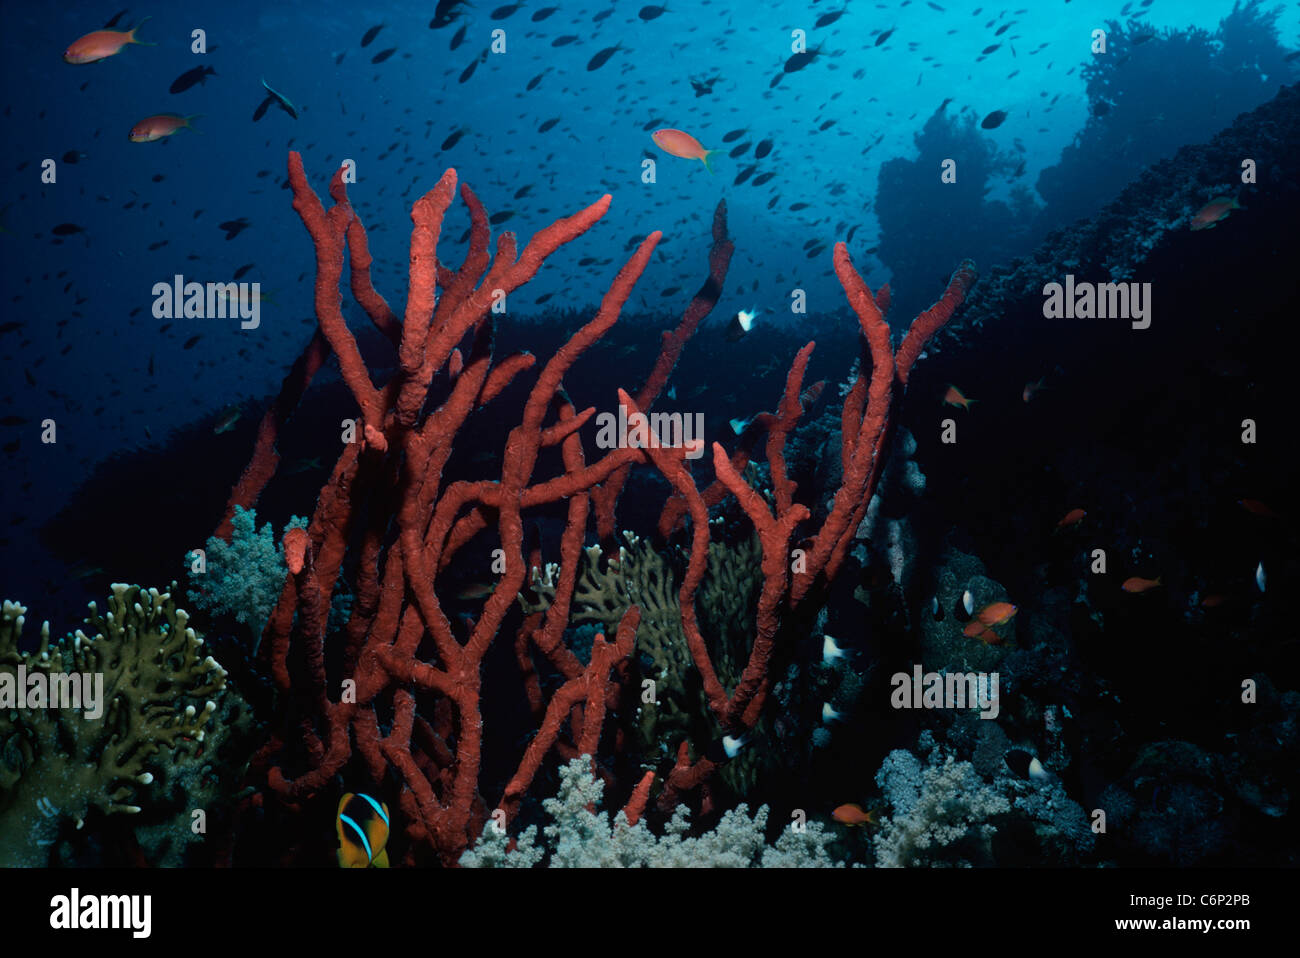 Red Finger Sponge (Latrunculia corticata) on coral reef with Anthias Goldfish (Anthias squamipinnis). Red Sea, Egypt - Stock Image